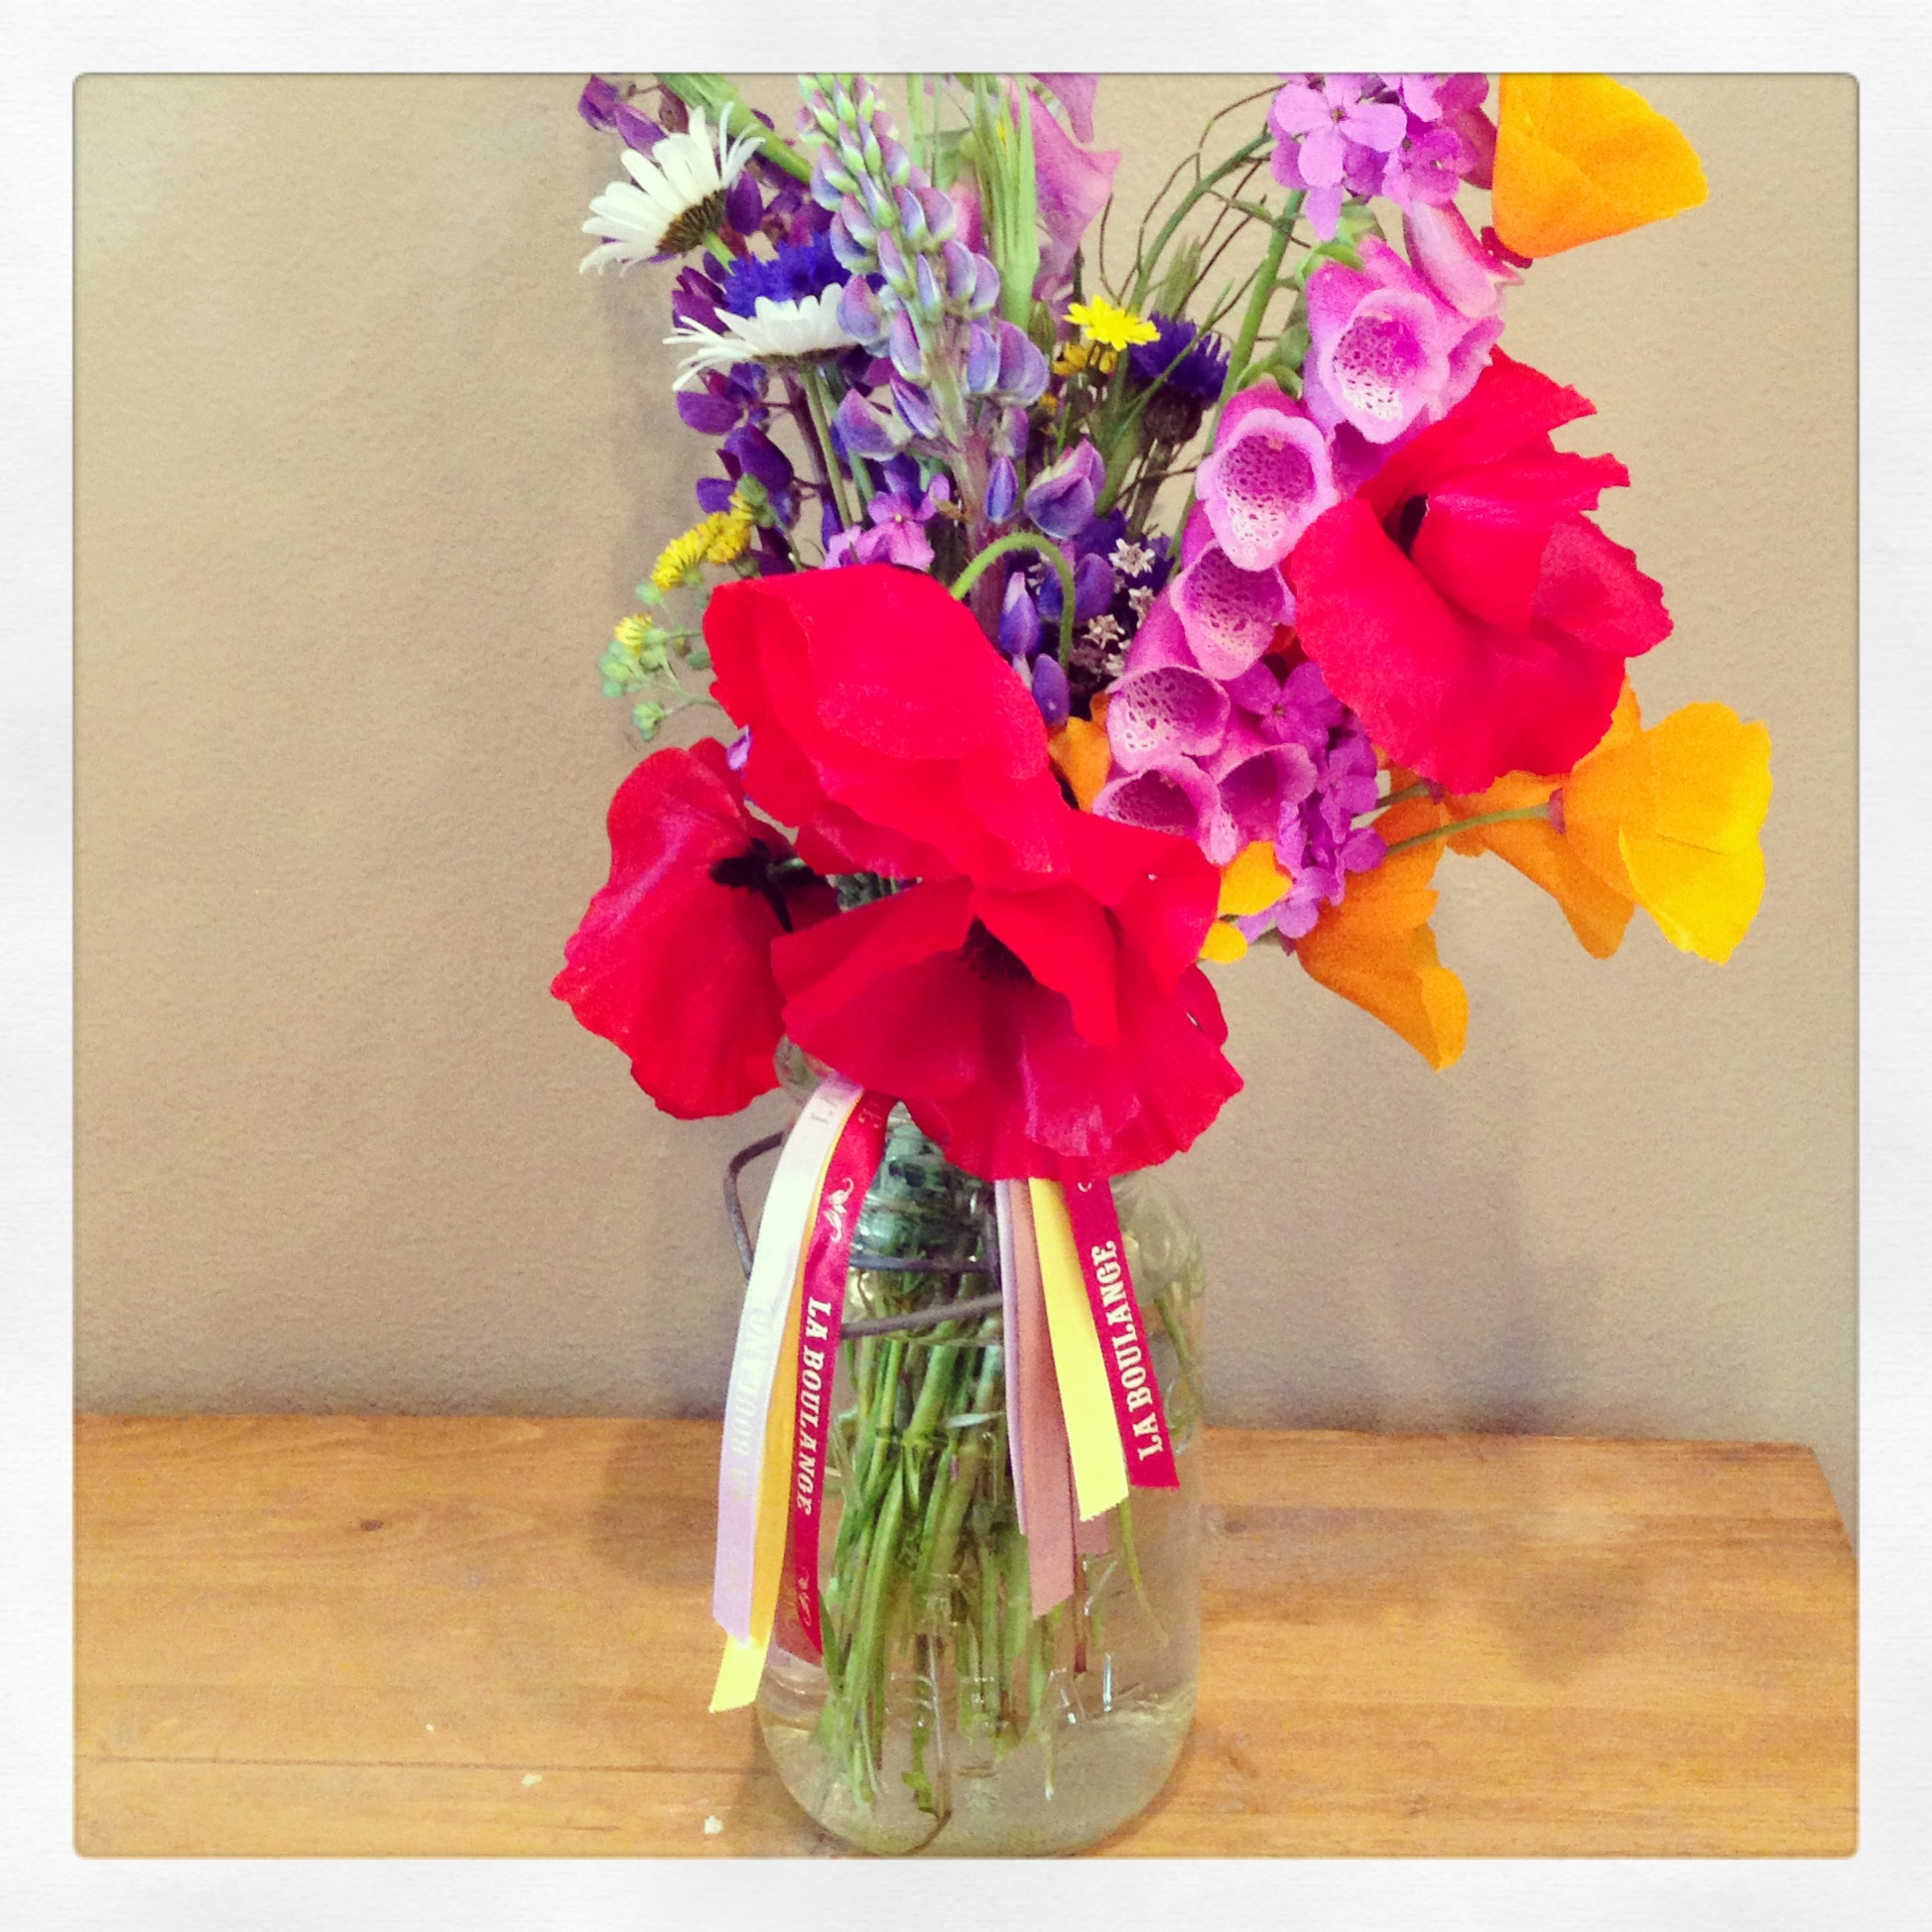 La Boulange wildflowers